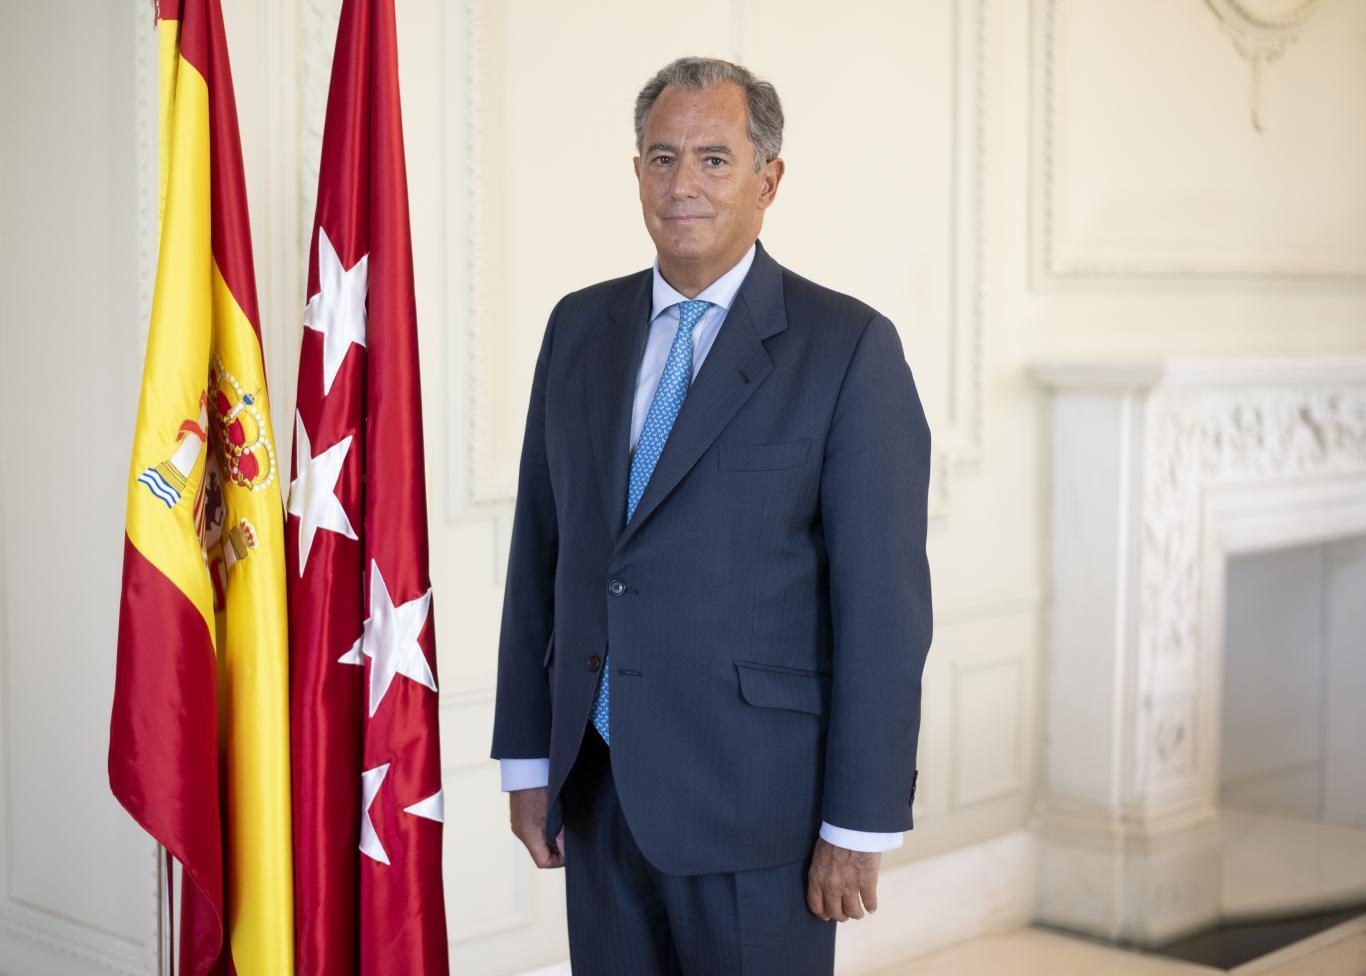 Imagen Enrique Ossorio